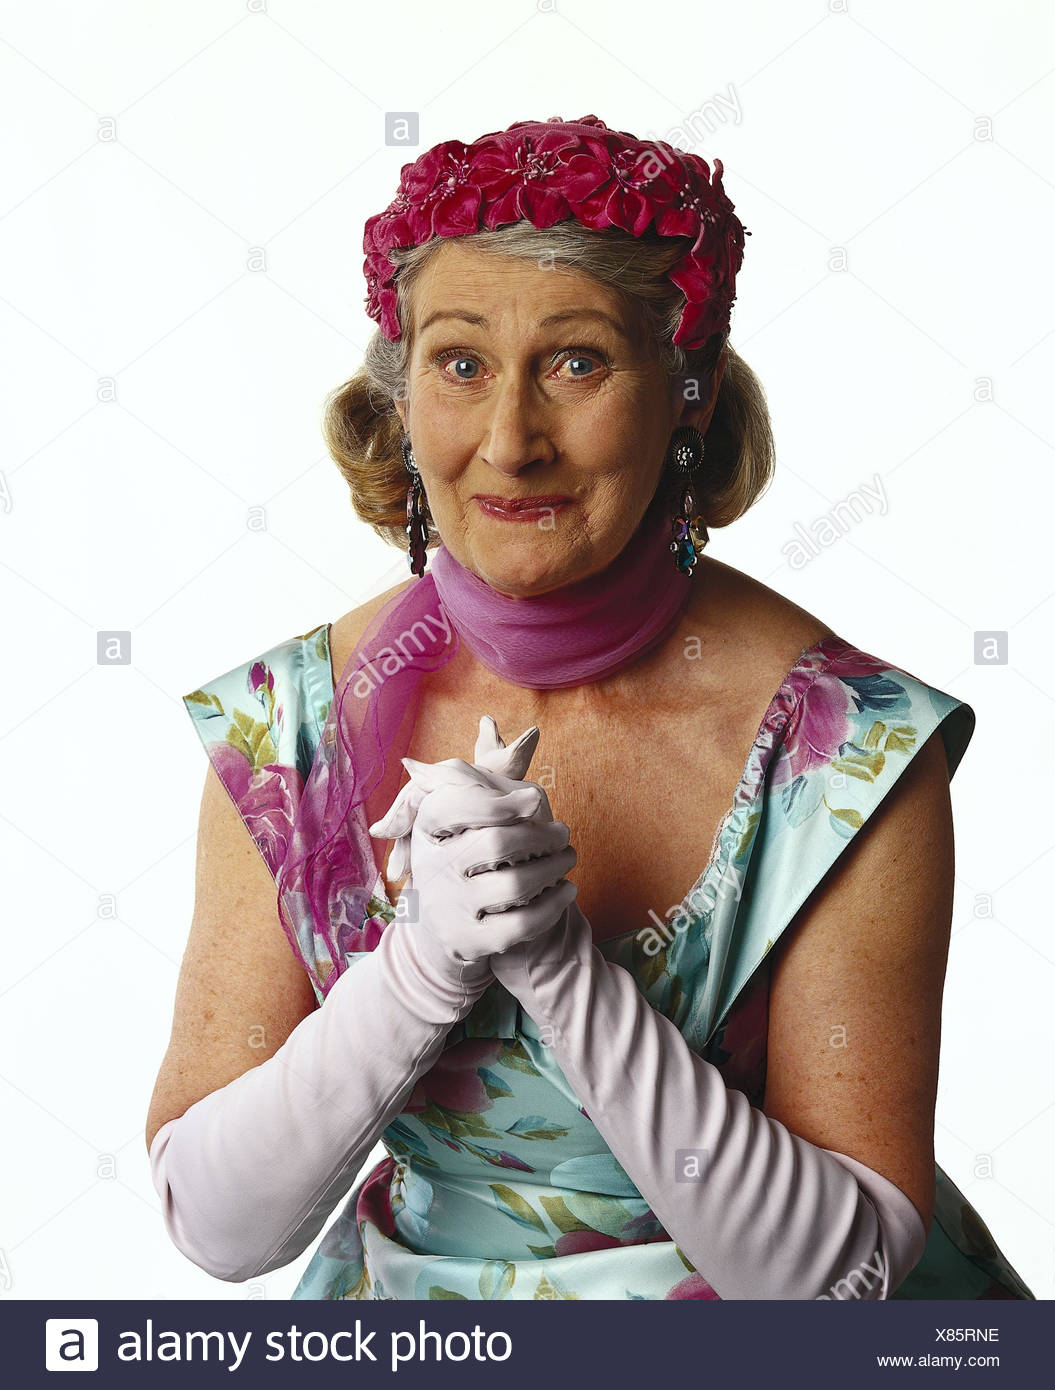 Senior, care, dress, neckerchief, white gloves, gesture, hands, half portrait, mb 125 A3 - Stock Image